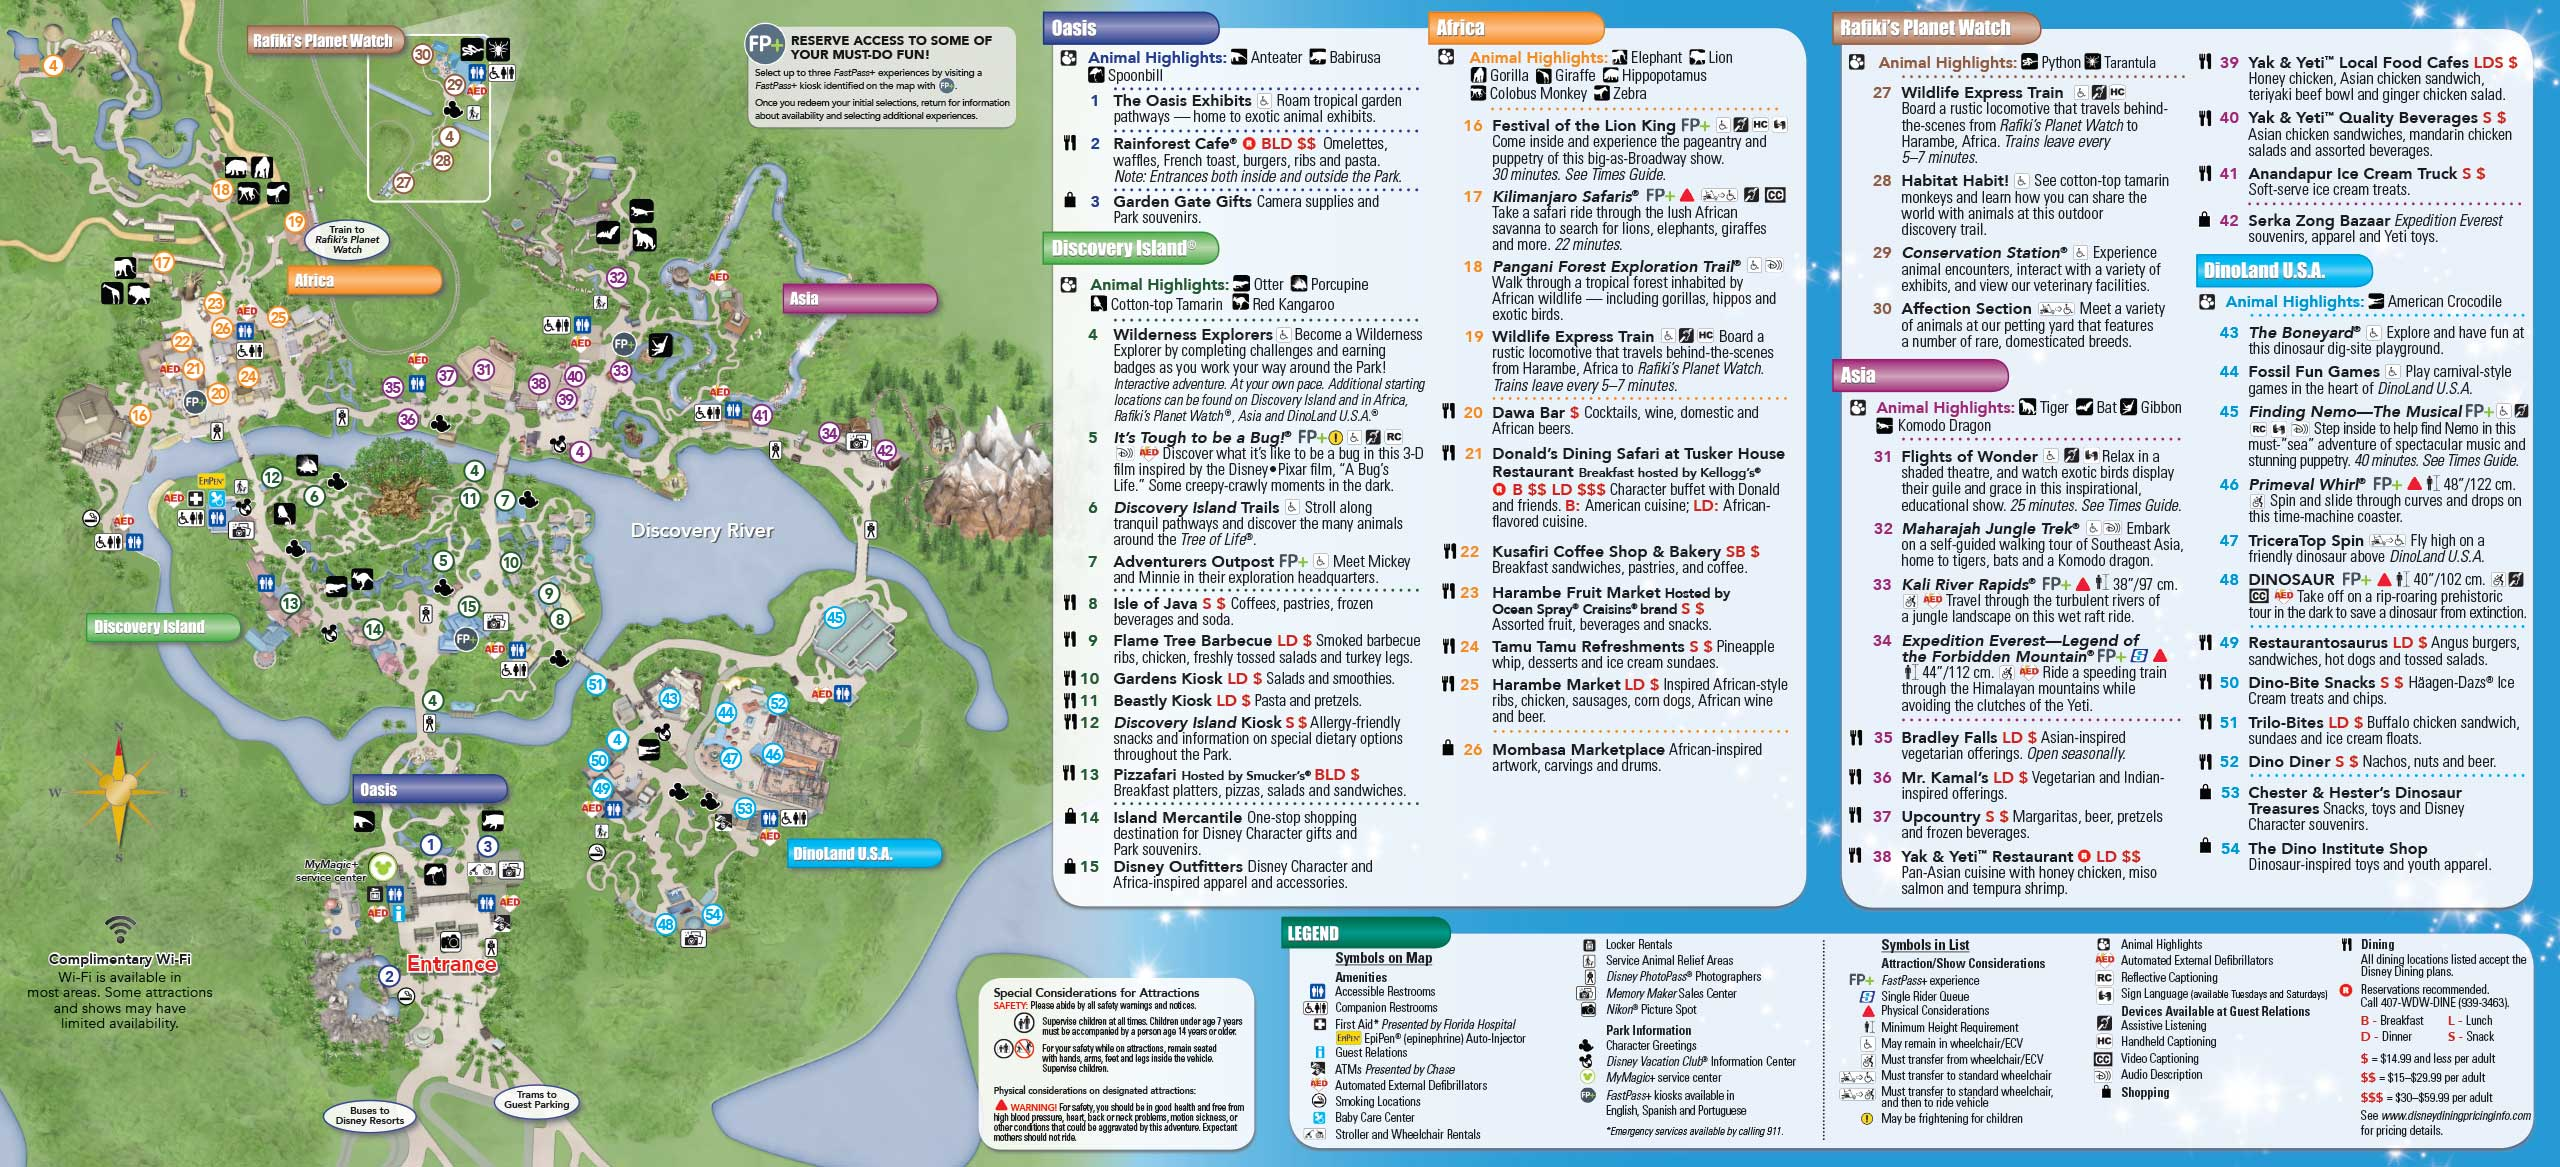 May 2015 Walt Disney World Resort Park Maps - Photo 2 of 14